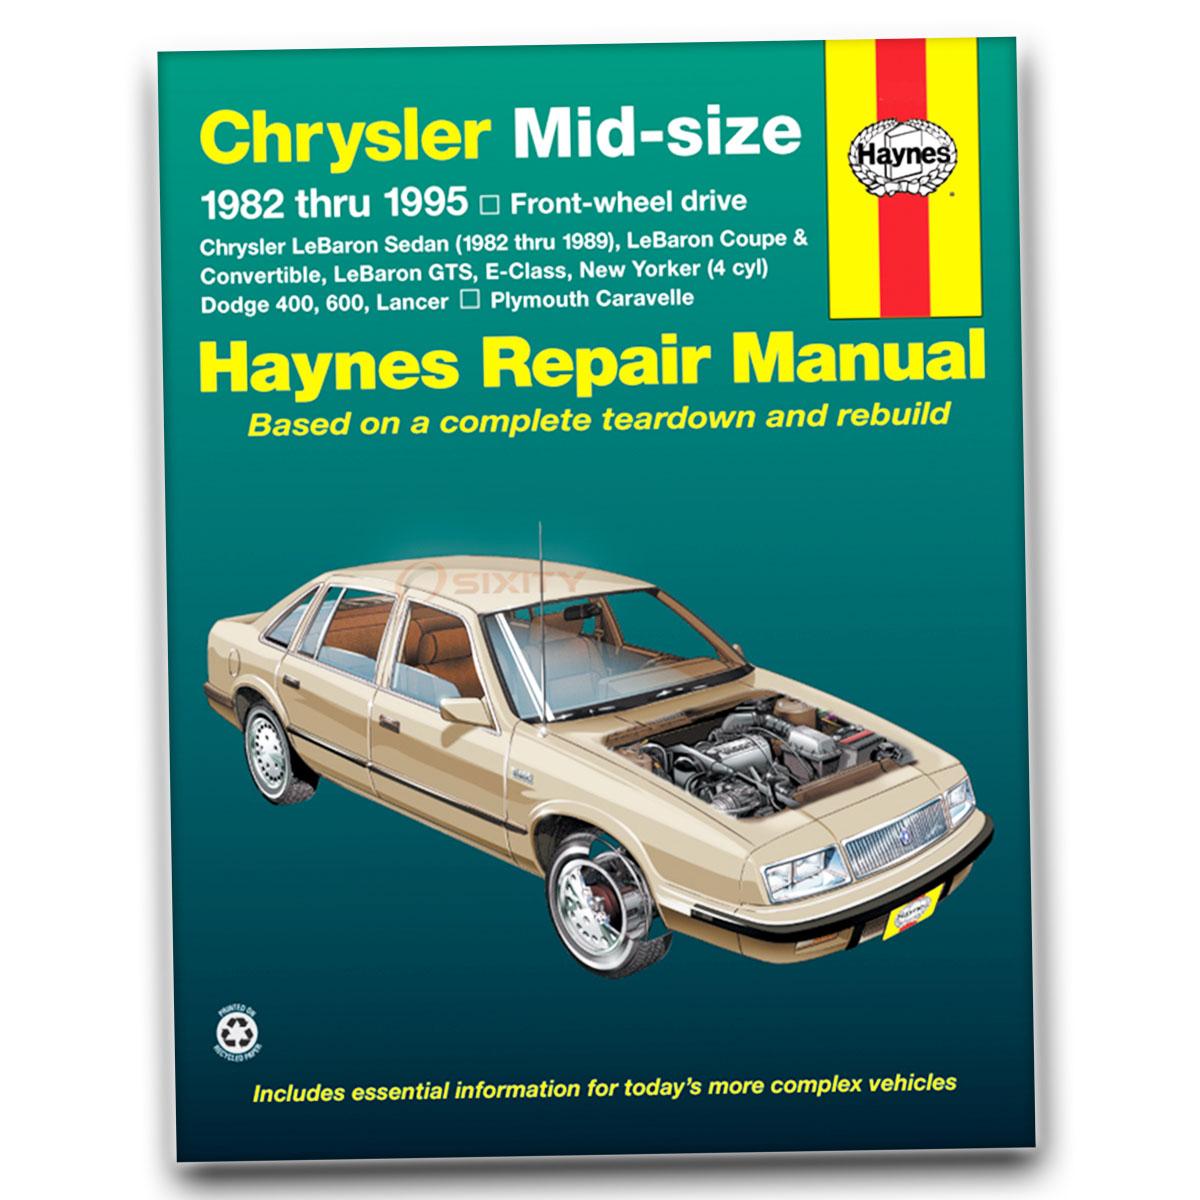 Haynes Repair Manual for Chrysler New Yorker Turbo Base Shop Service Garage  re